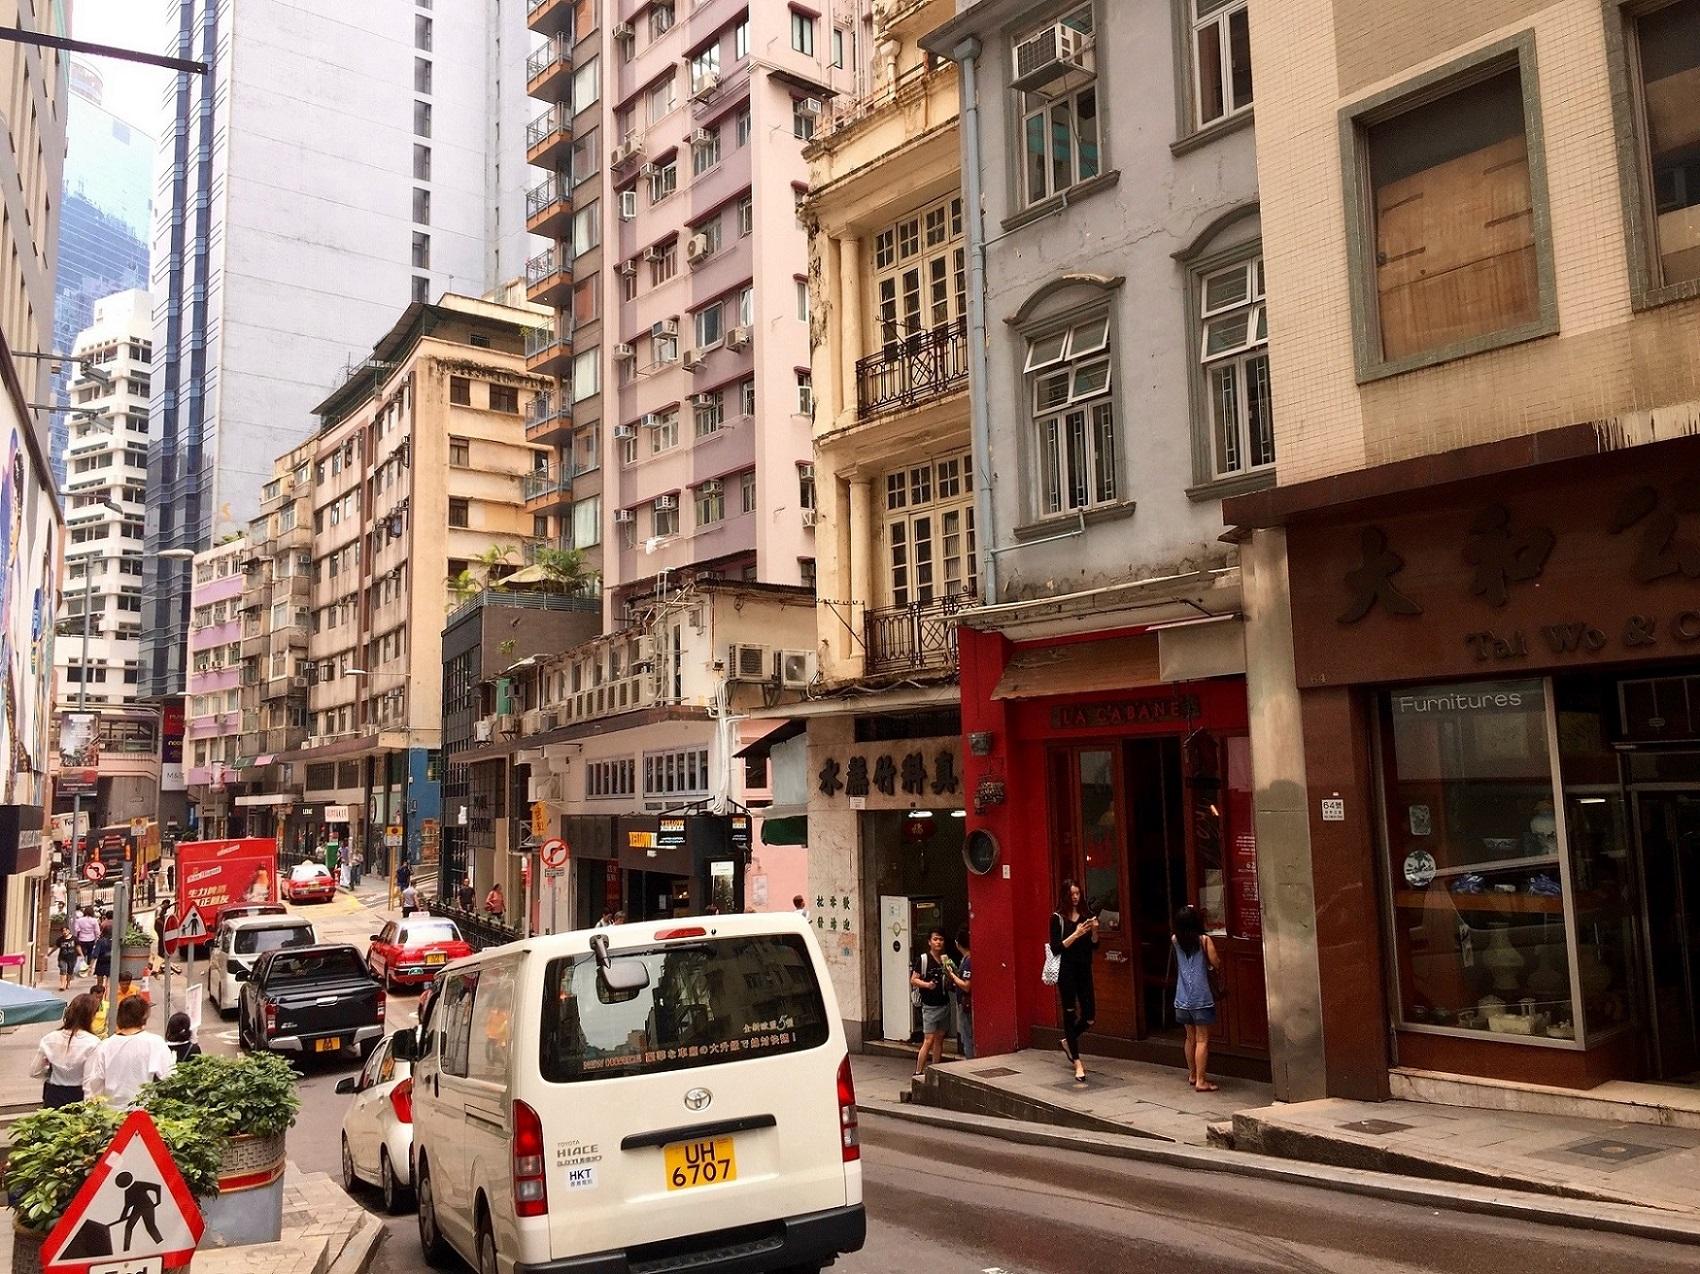 Hollywood Road Hong Kong for restaurants cafes bars galleries antique-shops